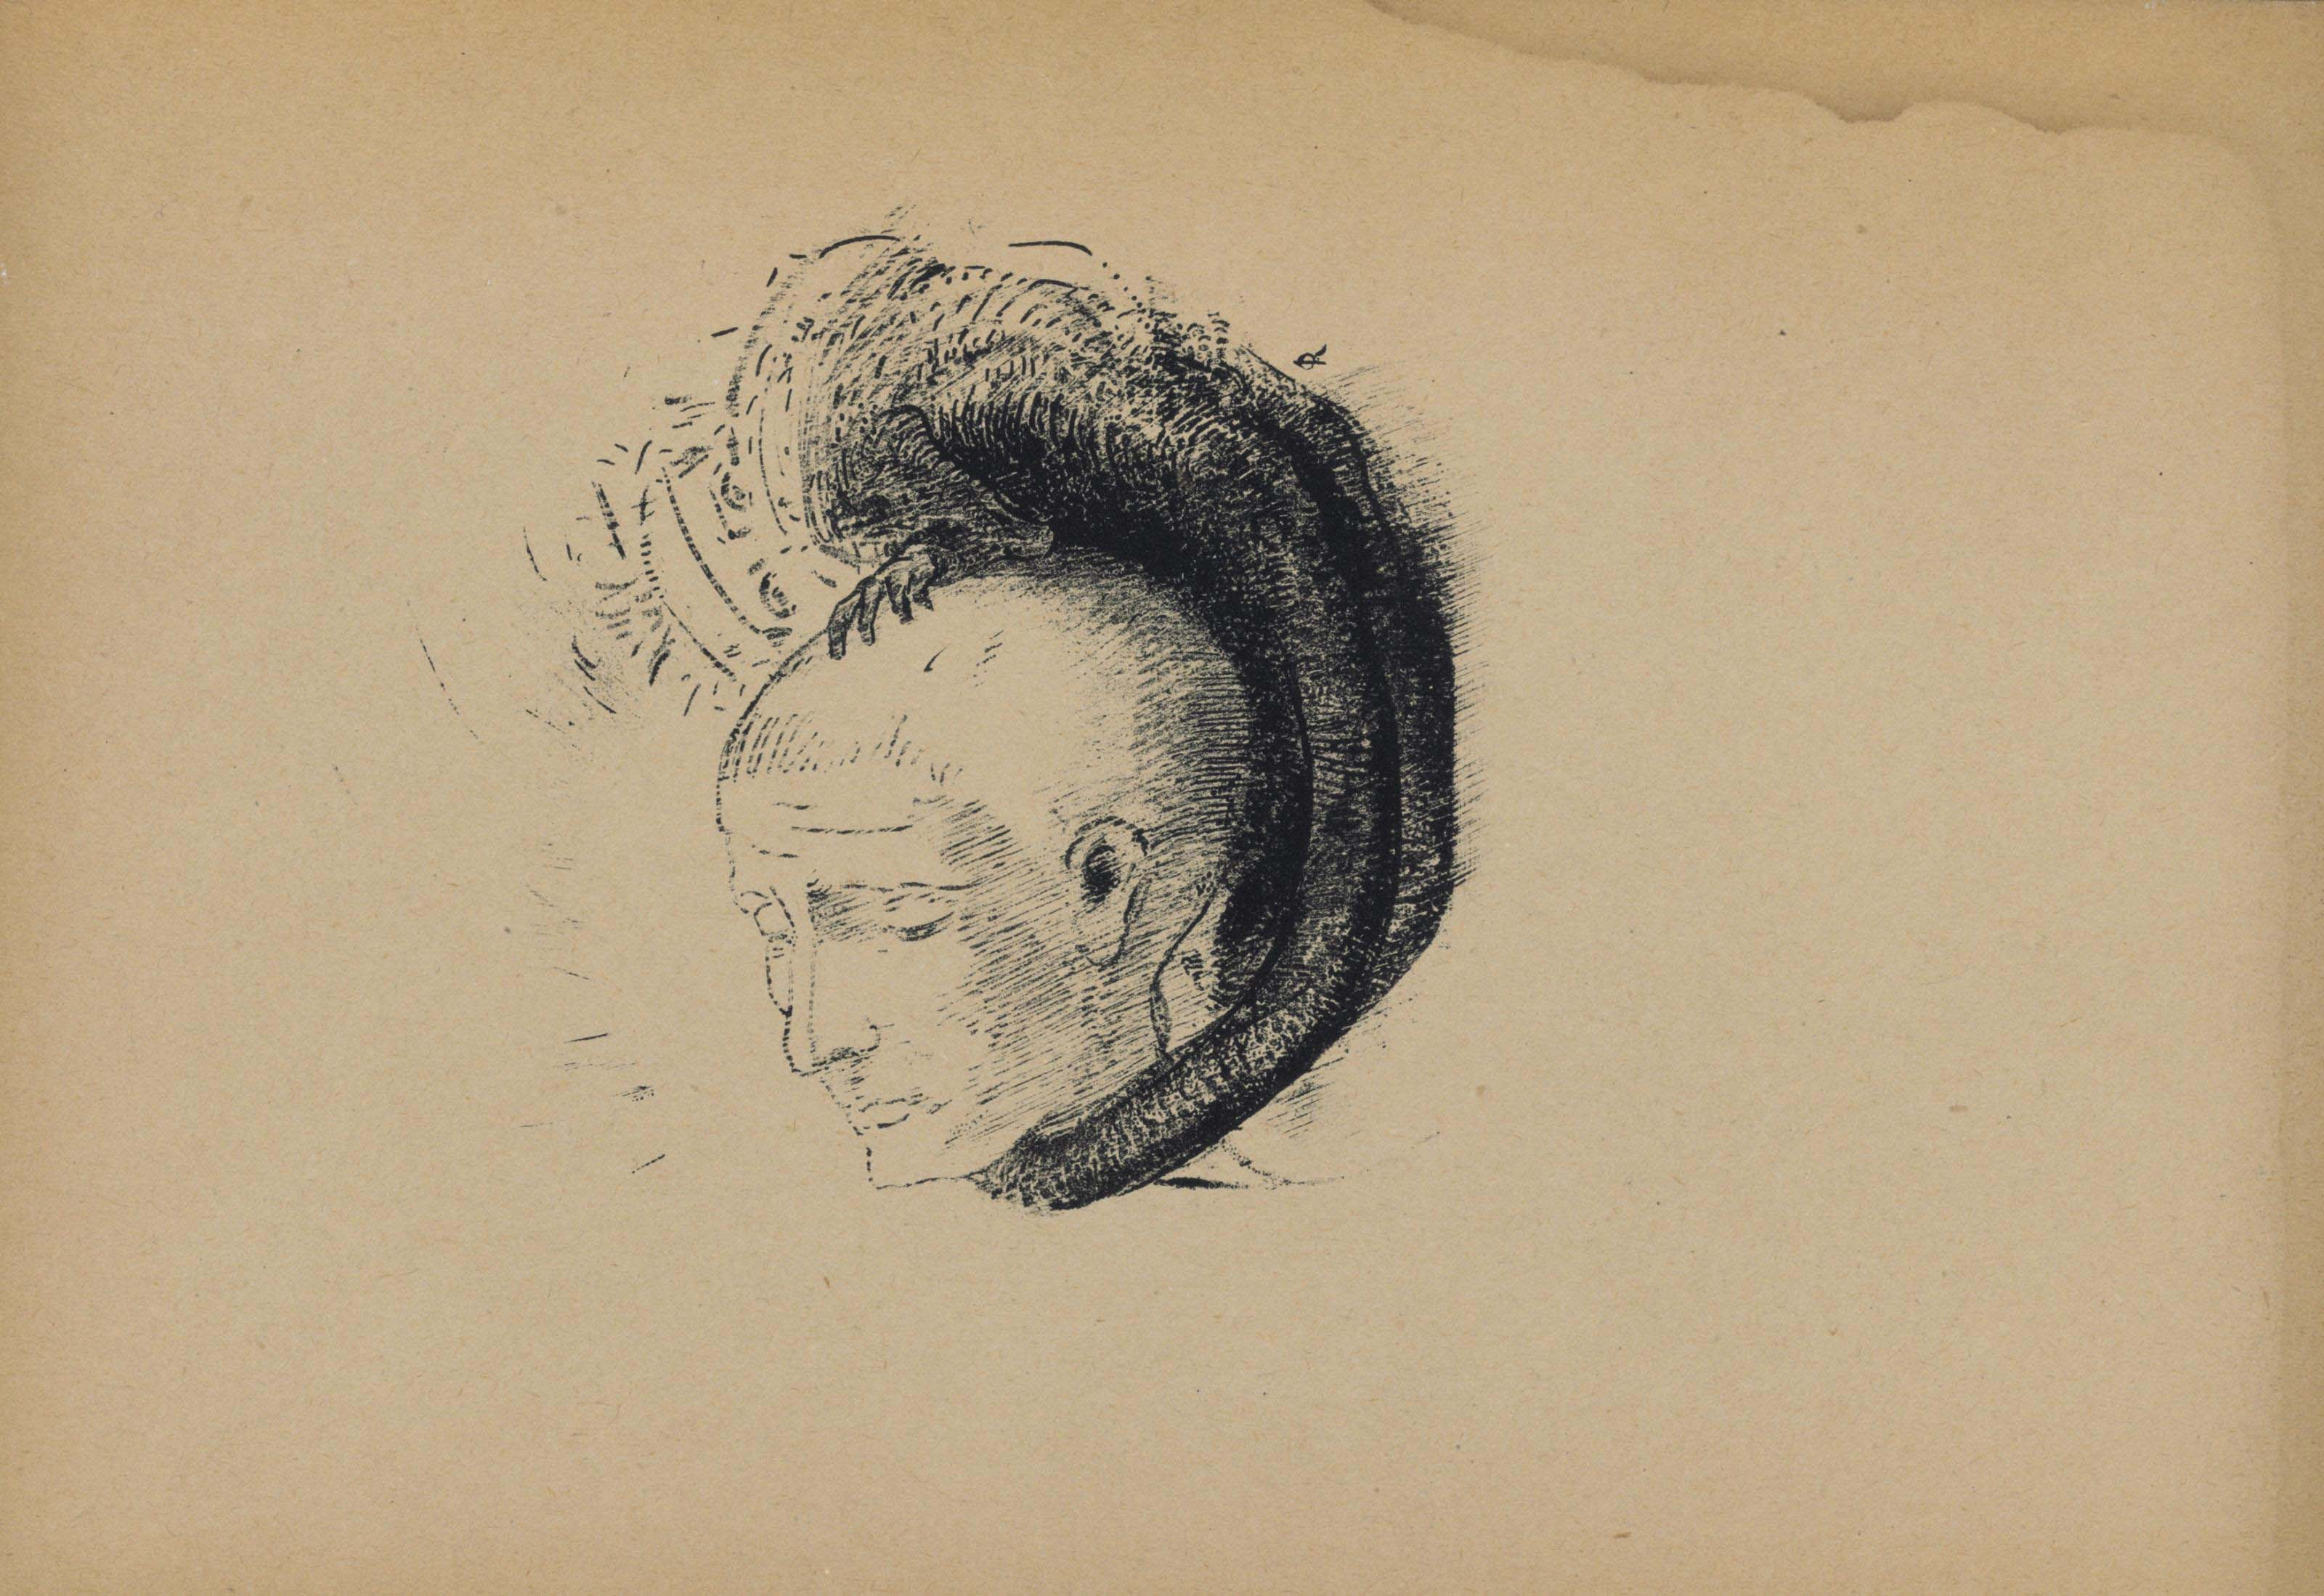 REDON, Odilon (1840-1916), ill